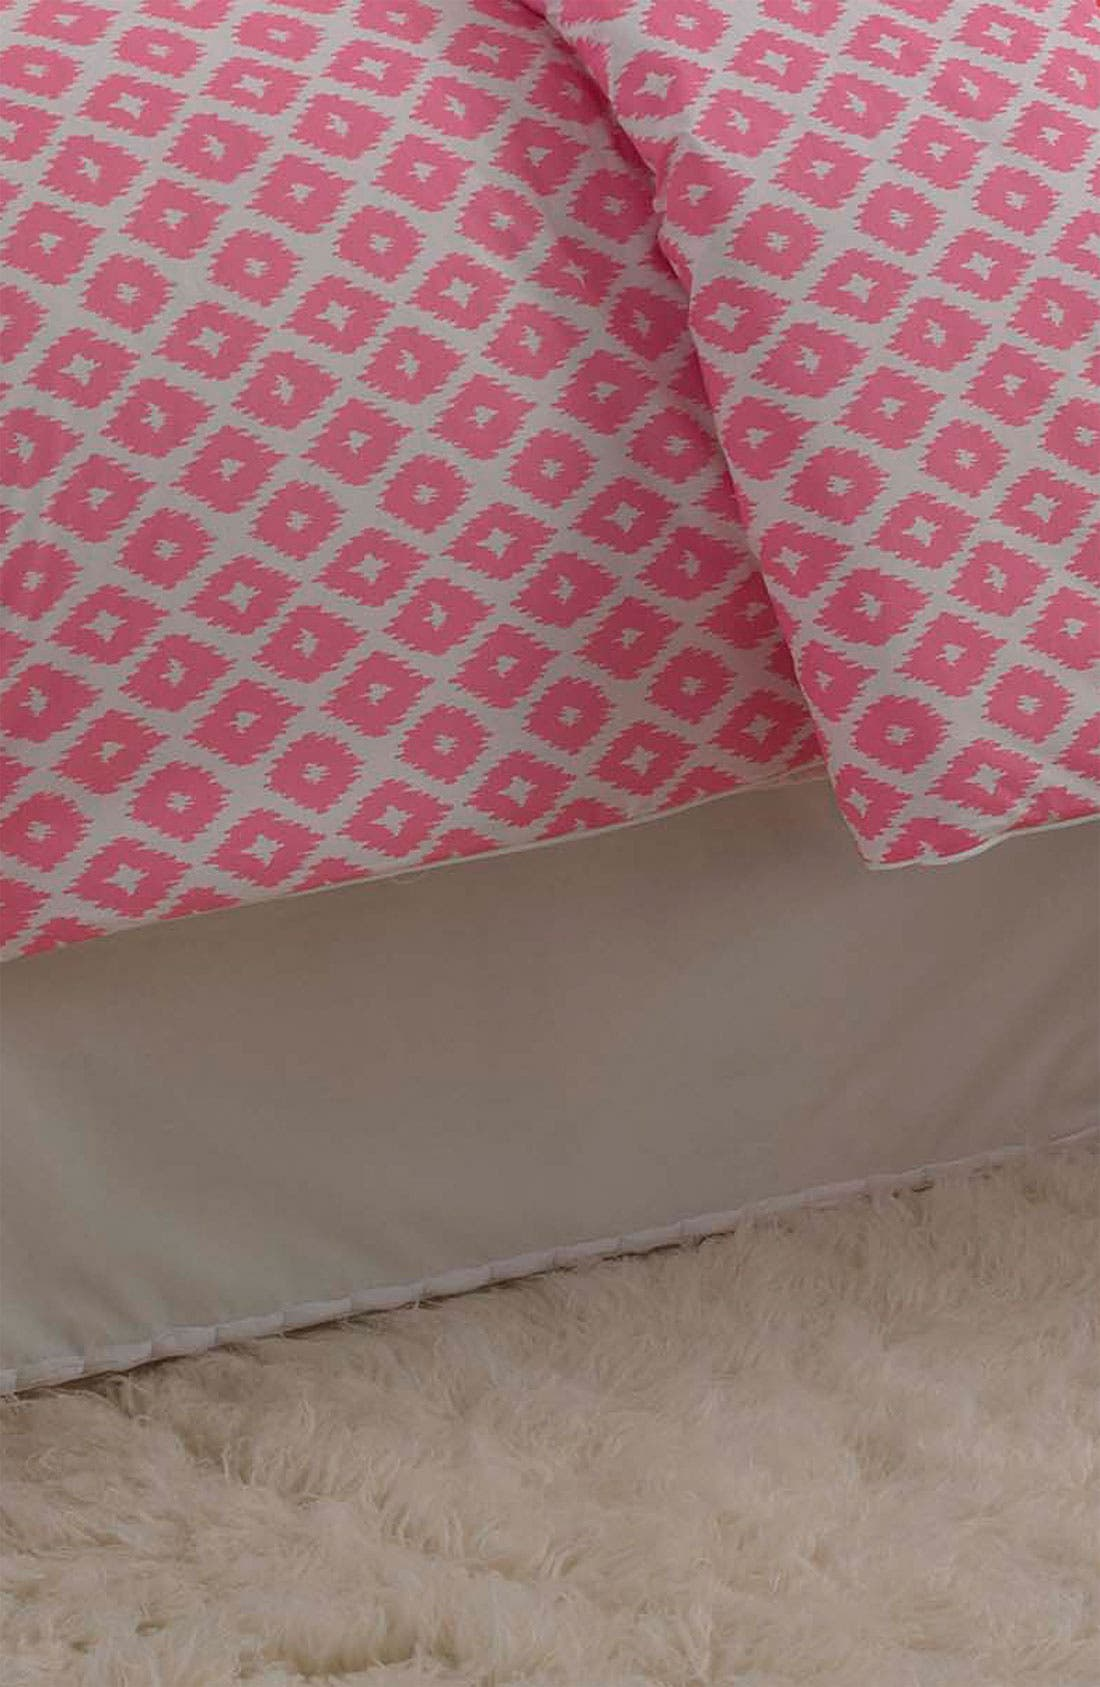 Alternate Image 1 Selected - Dena Home 'Ikat Blossom' Bed Skirt